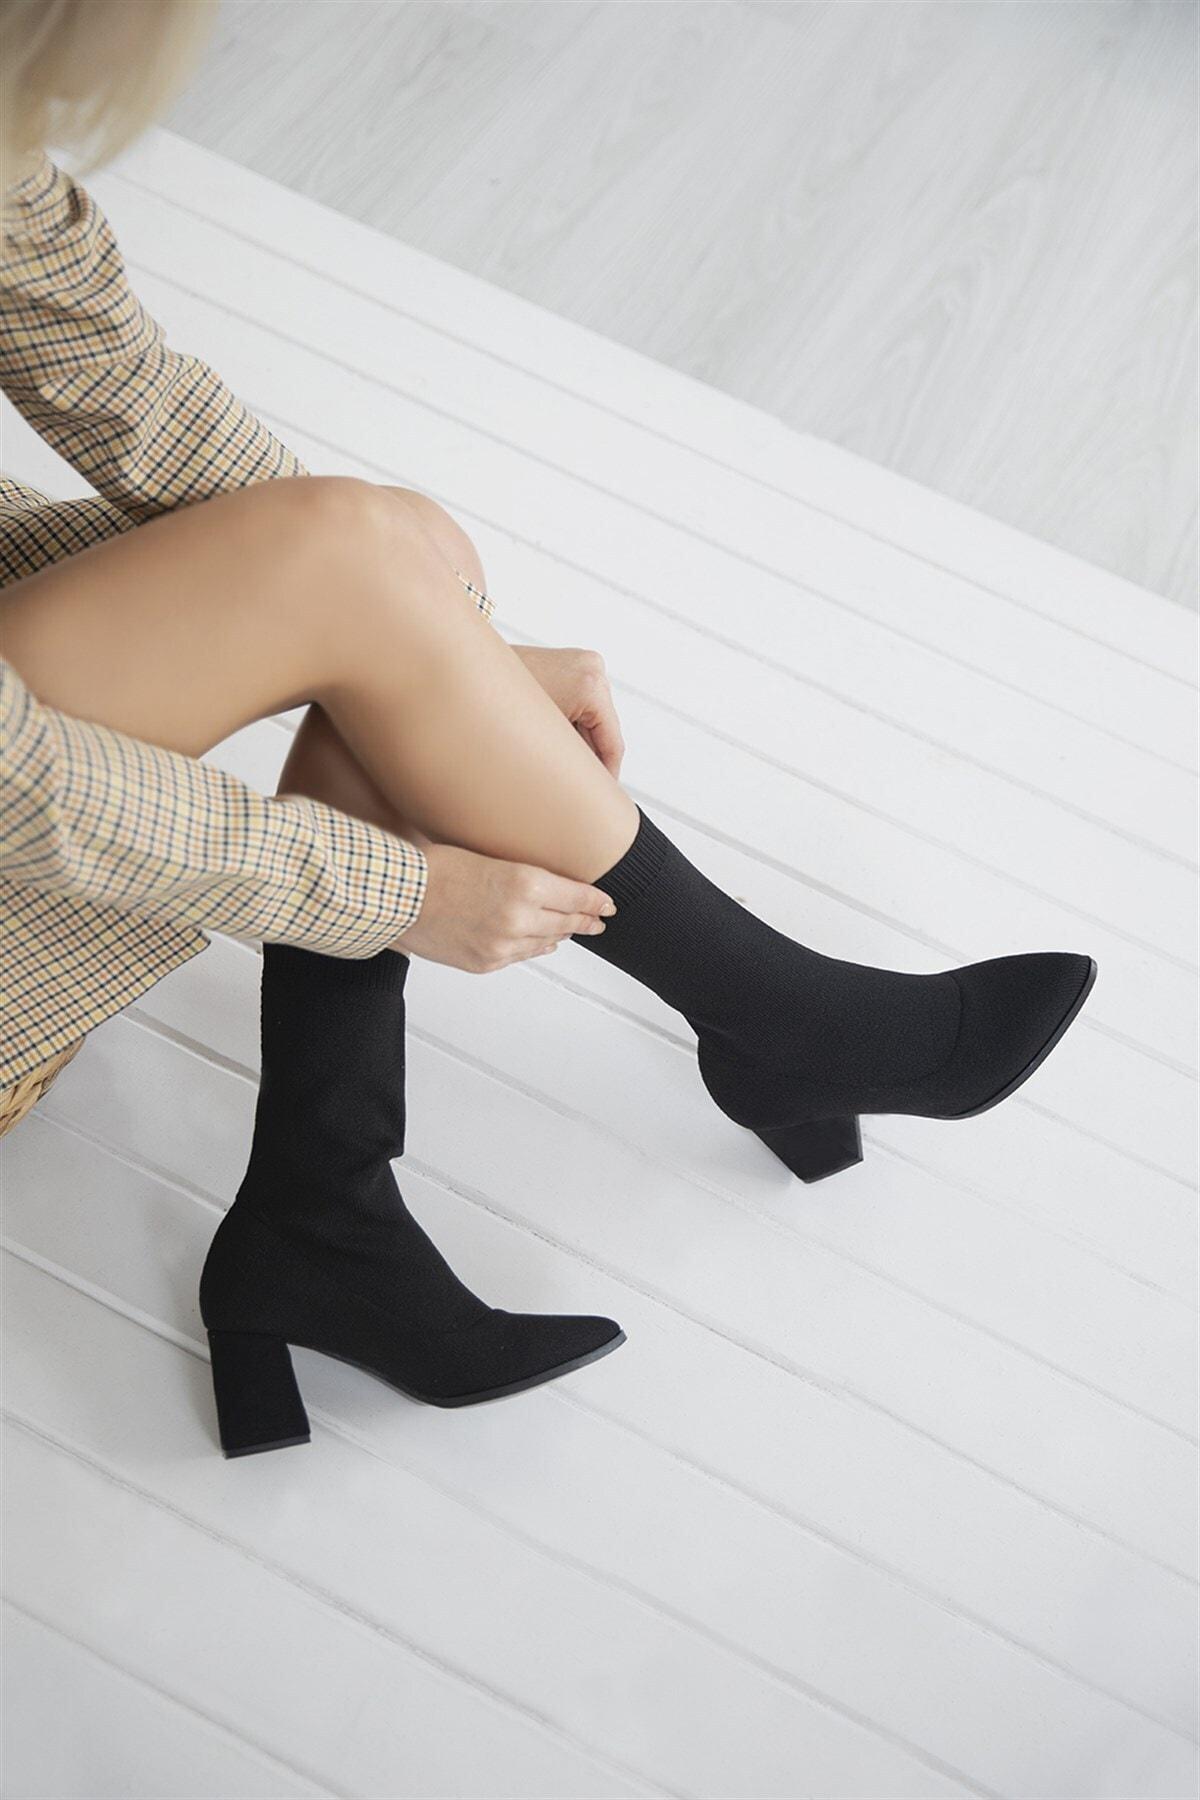 STRASWANS Foster Kadın Topuklu Streç Triko Bot Siyah 1